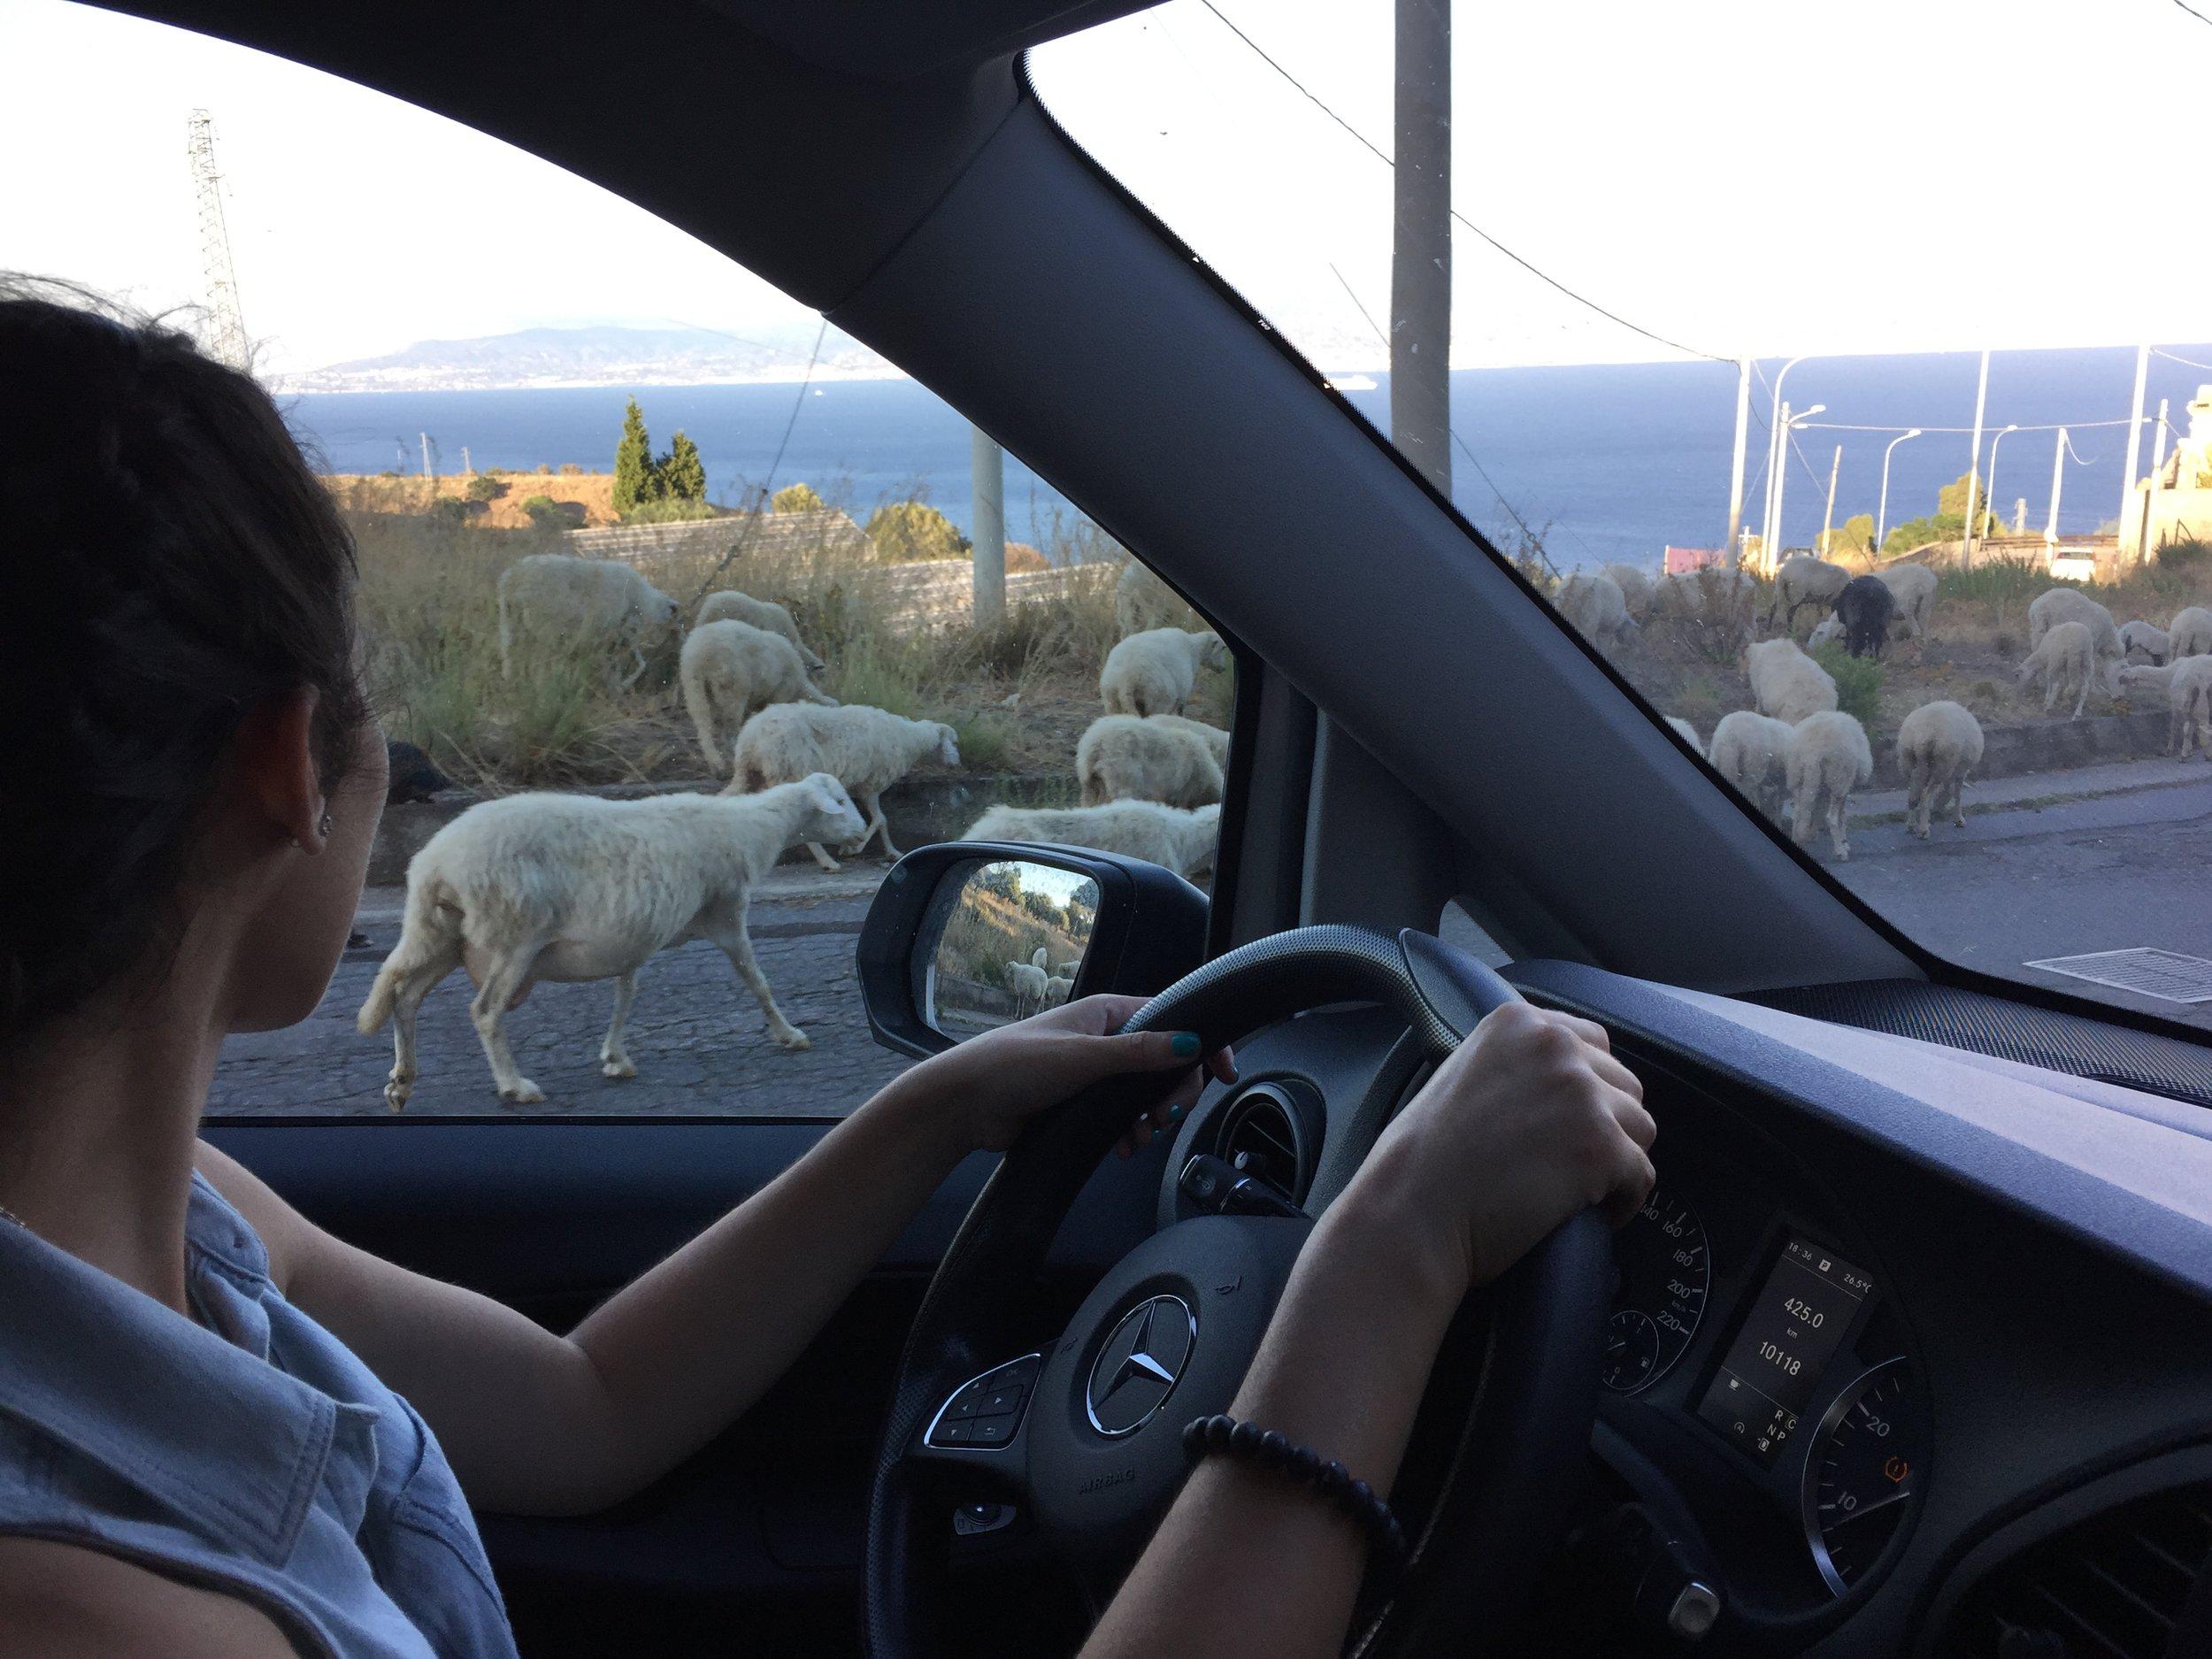 Driving in San Placido Calonerò